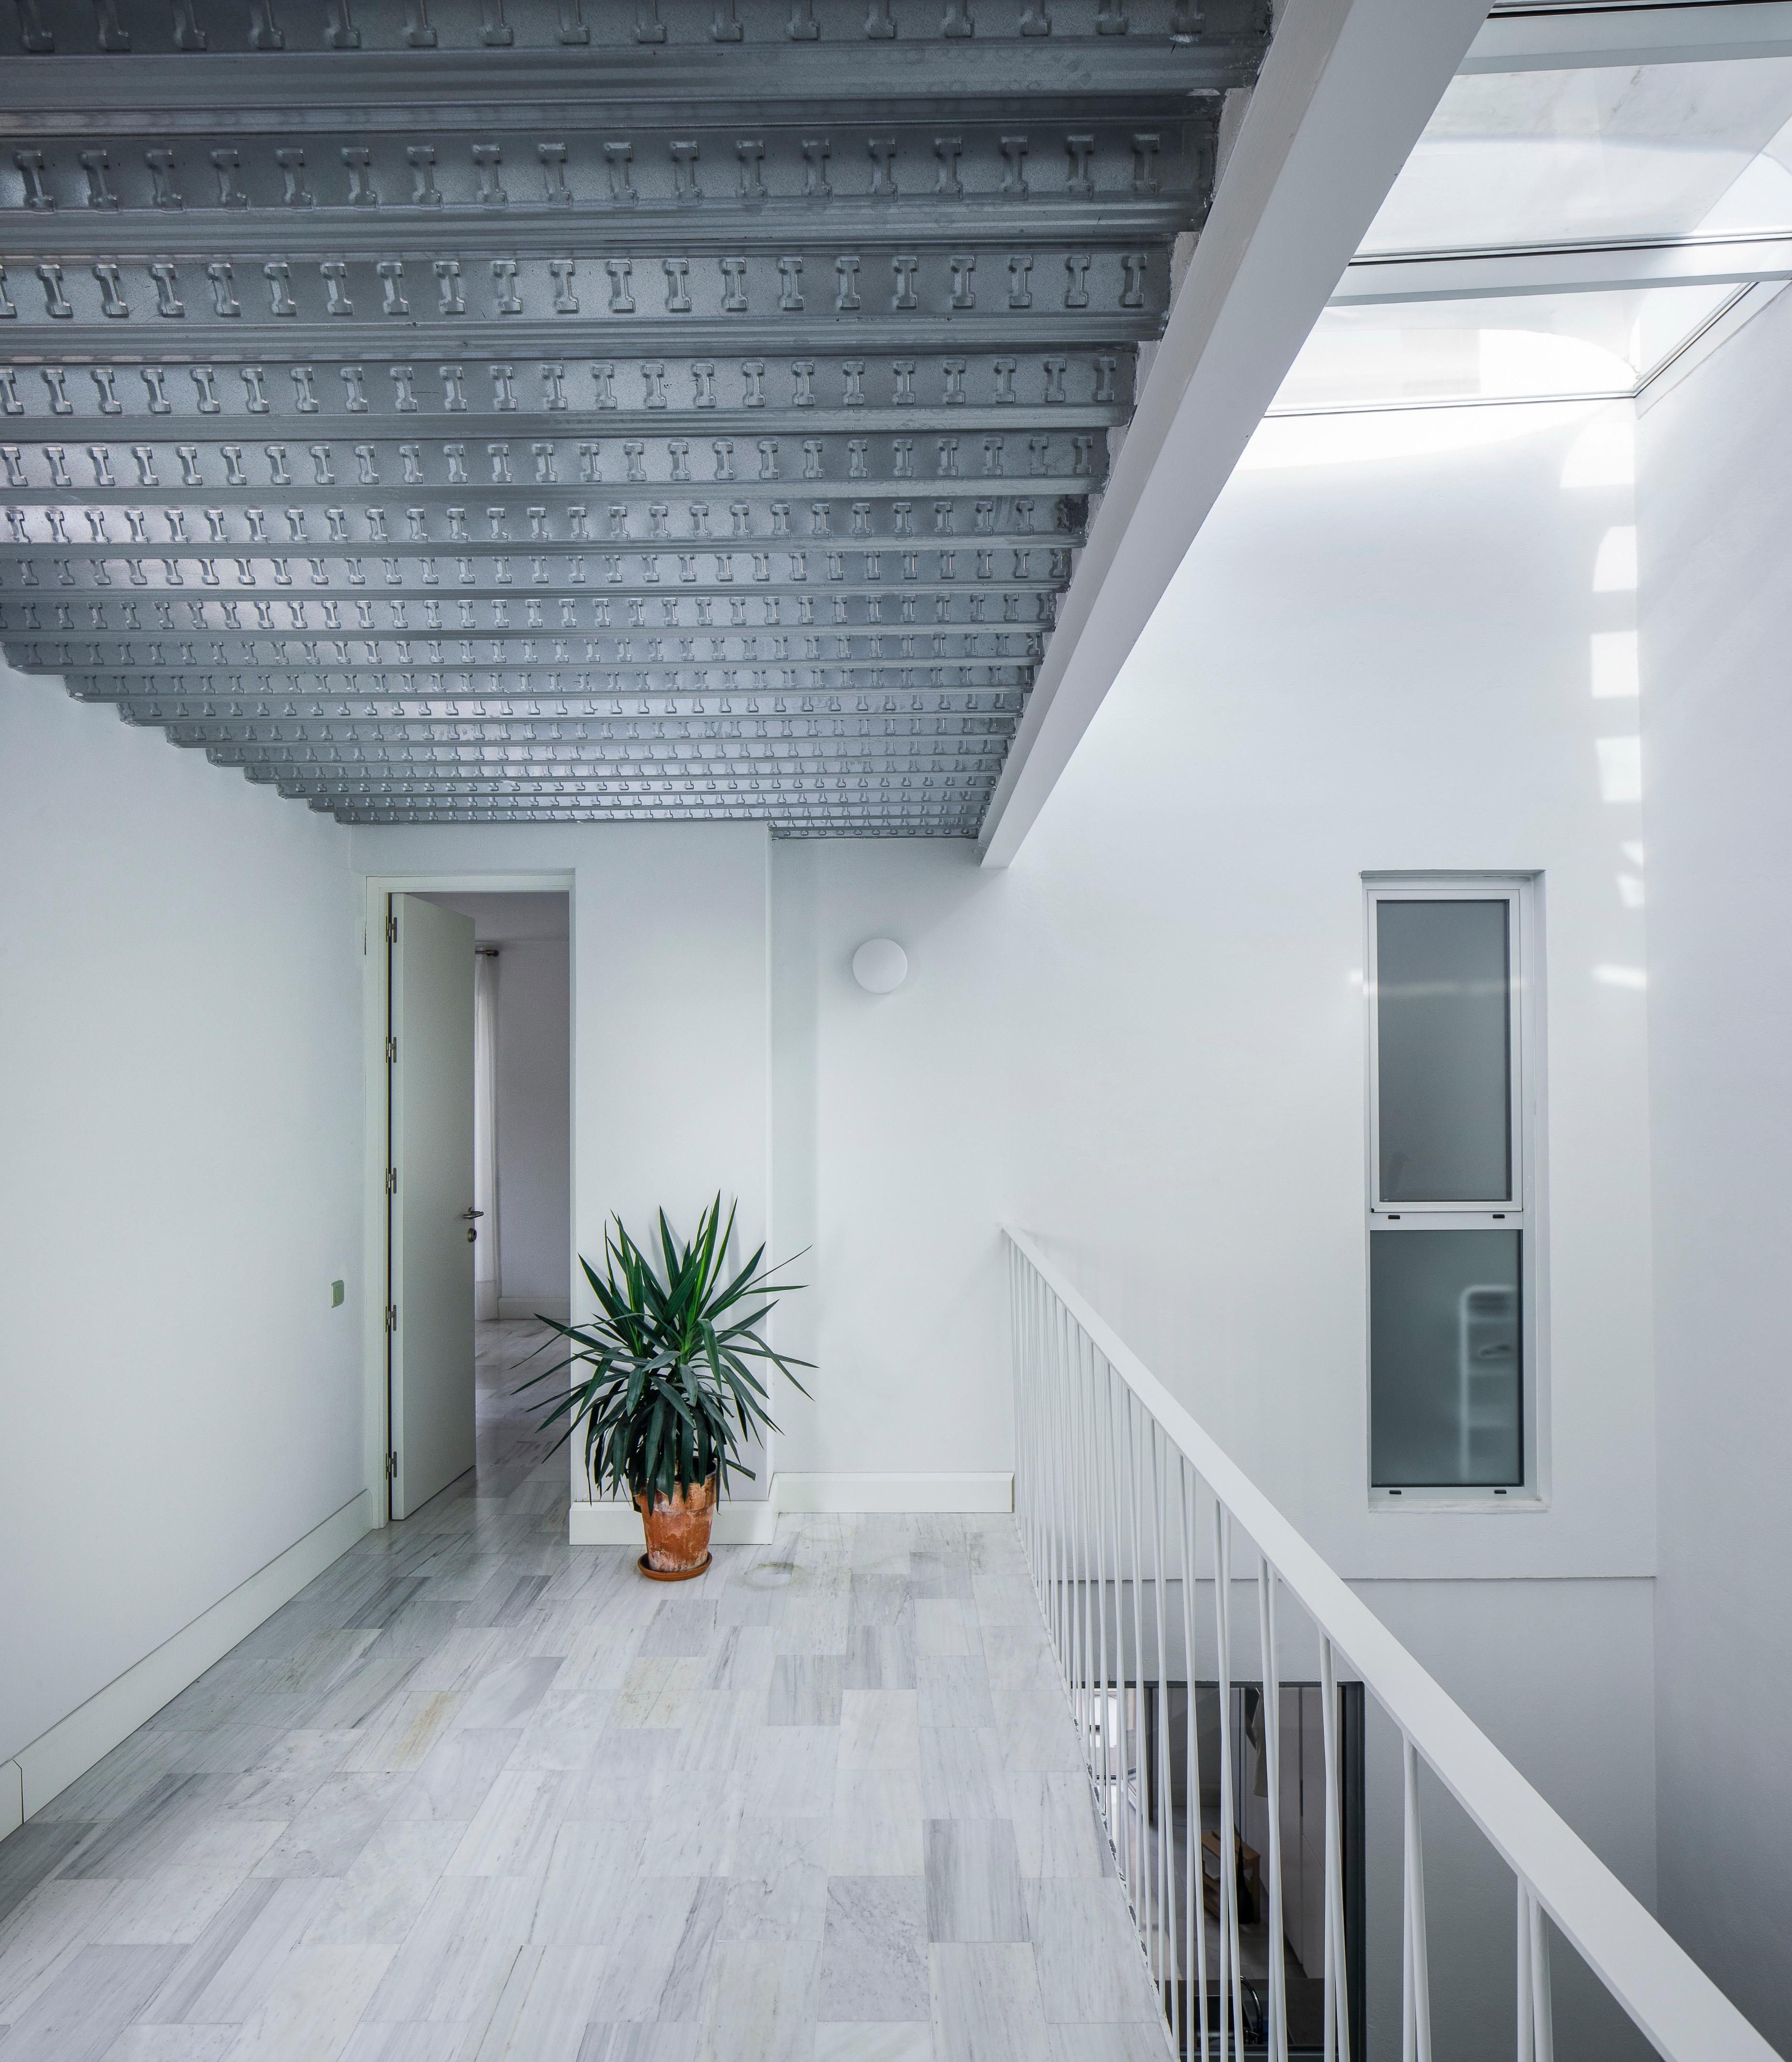 Casa Recacha in Seville, Spain by Studio Wet